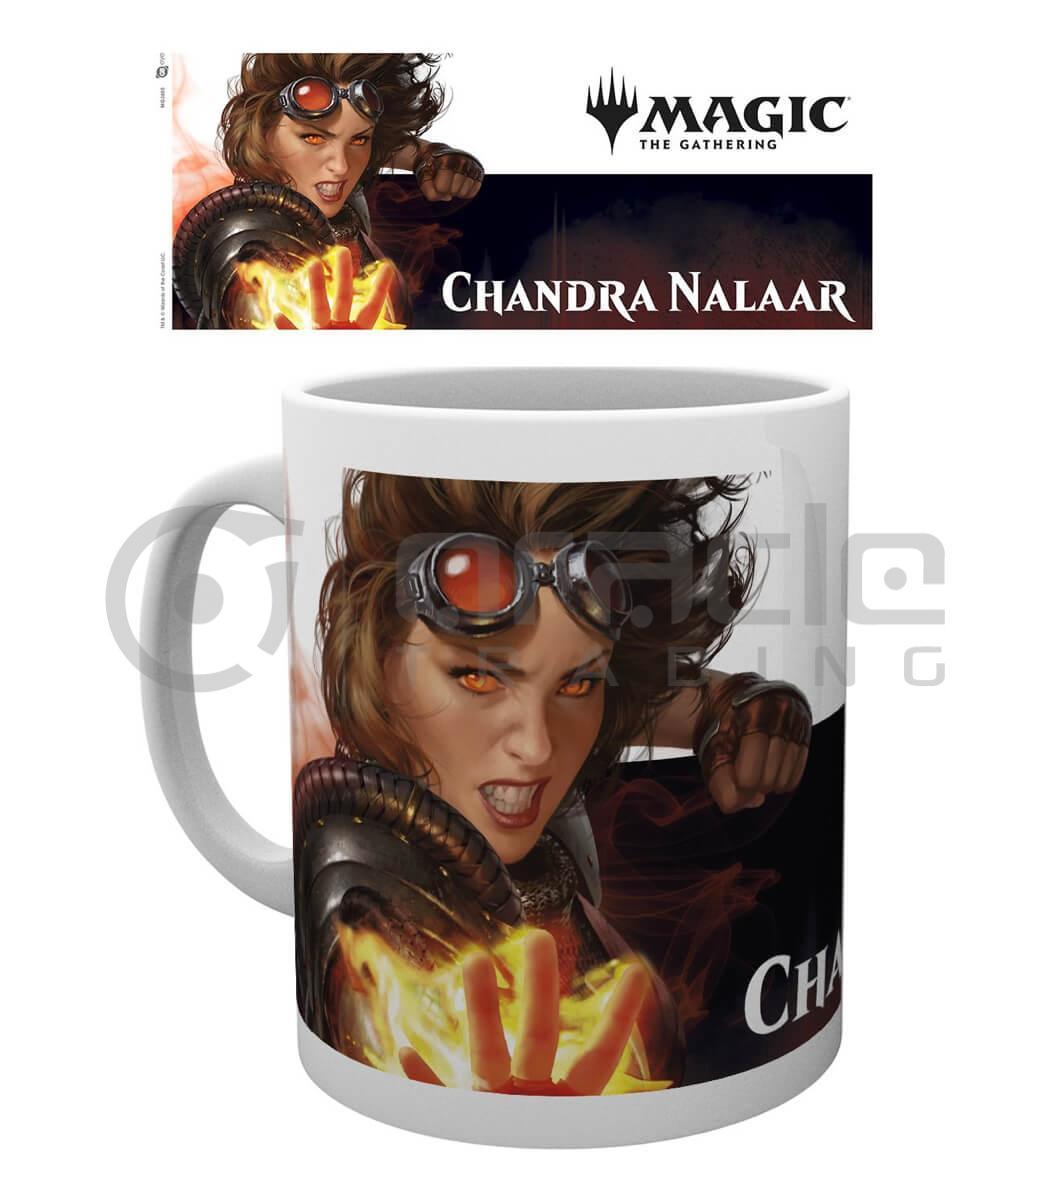 Magic the Gathering Mug - Chandra